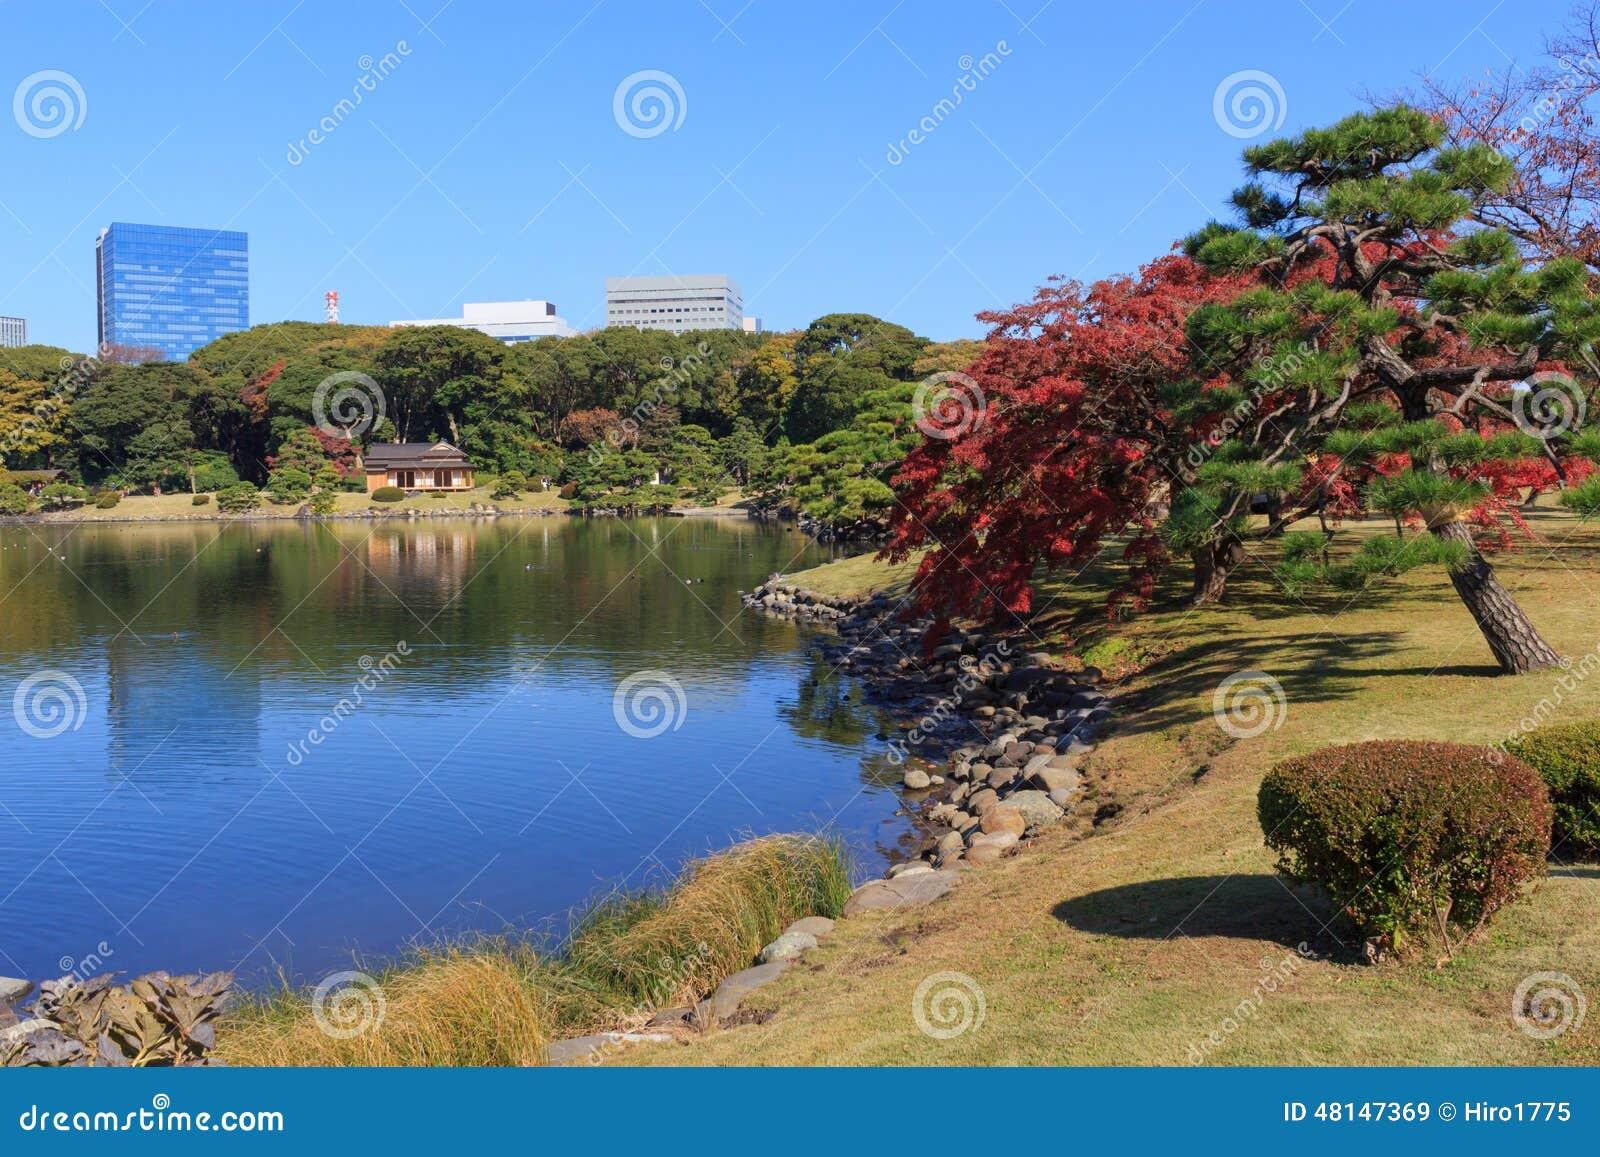 Foglie di autunno nei giardini di hamarikyu tokyo for Laghetti nei giardini